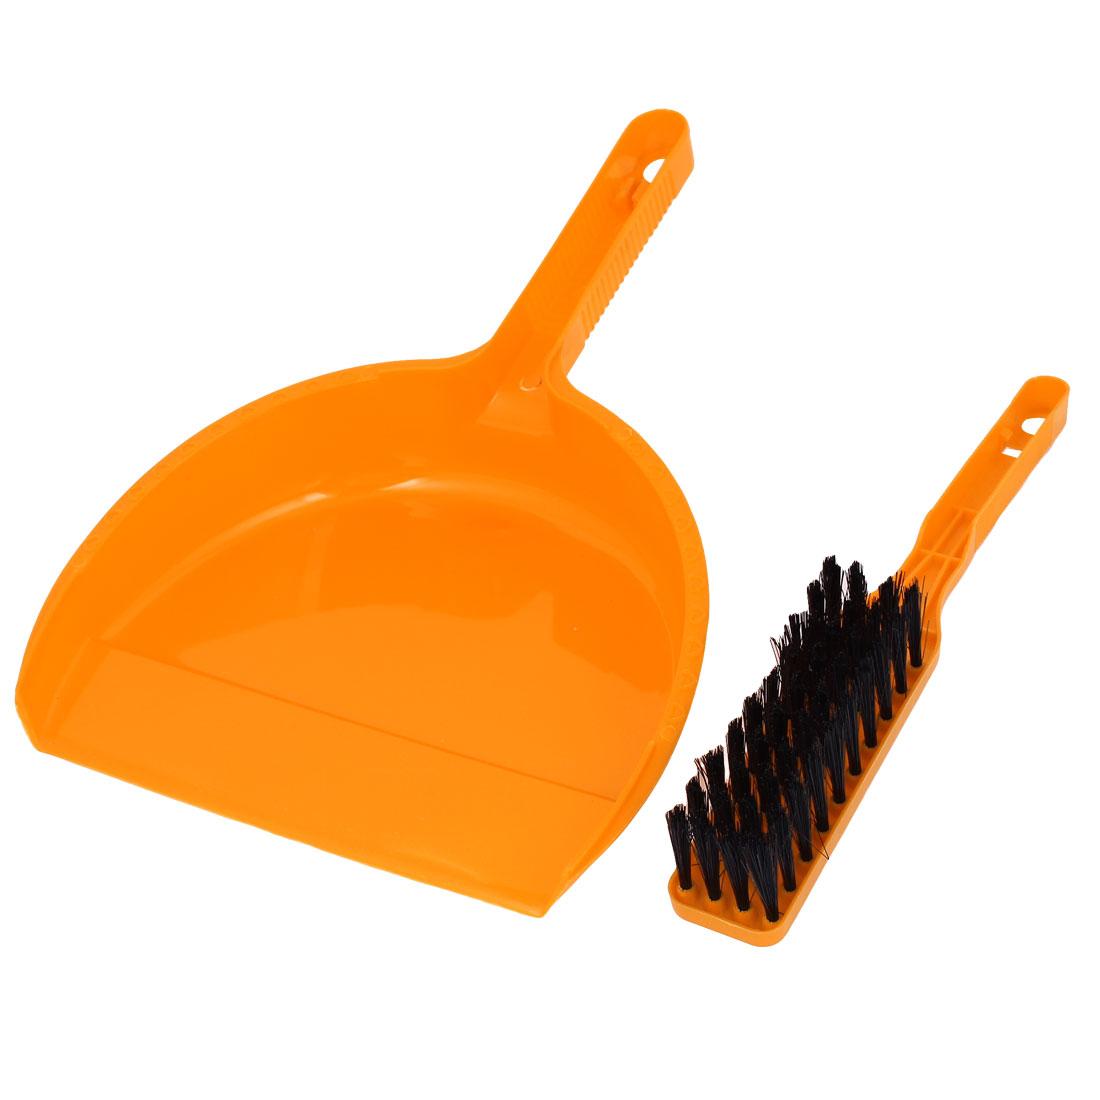 2 in 1 Plastic Nonslip Handle Mini Pet Whisk Brush Broom Dustpan Orange Clean Set